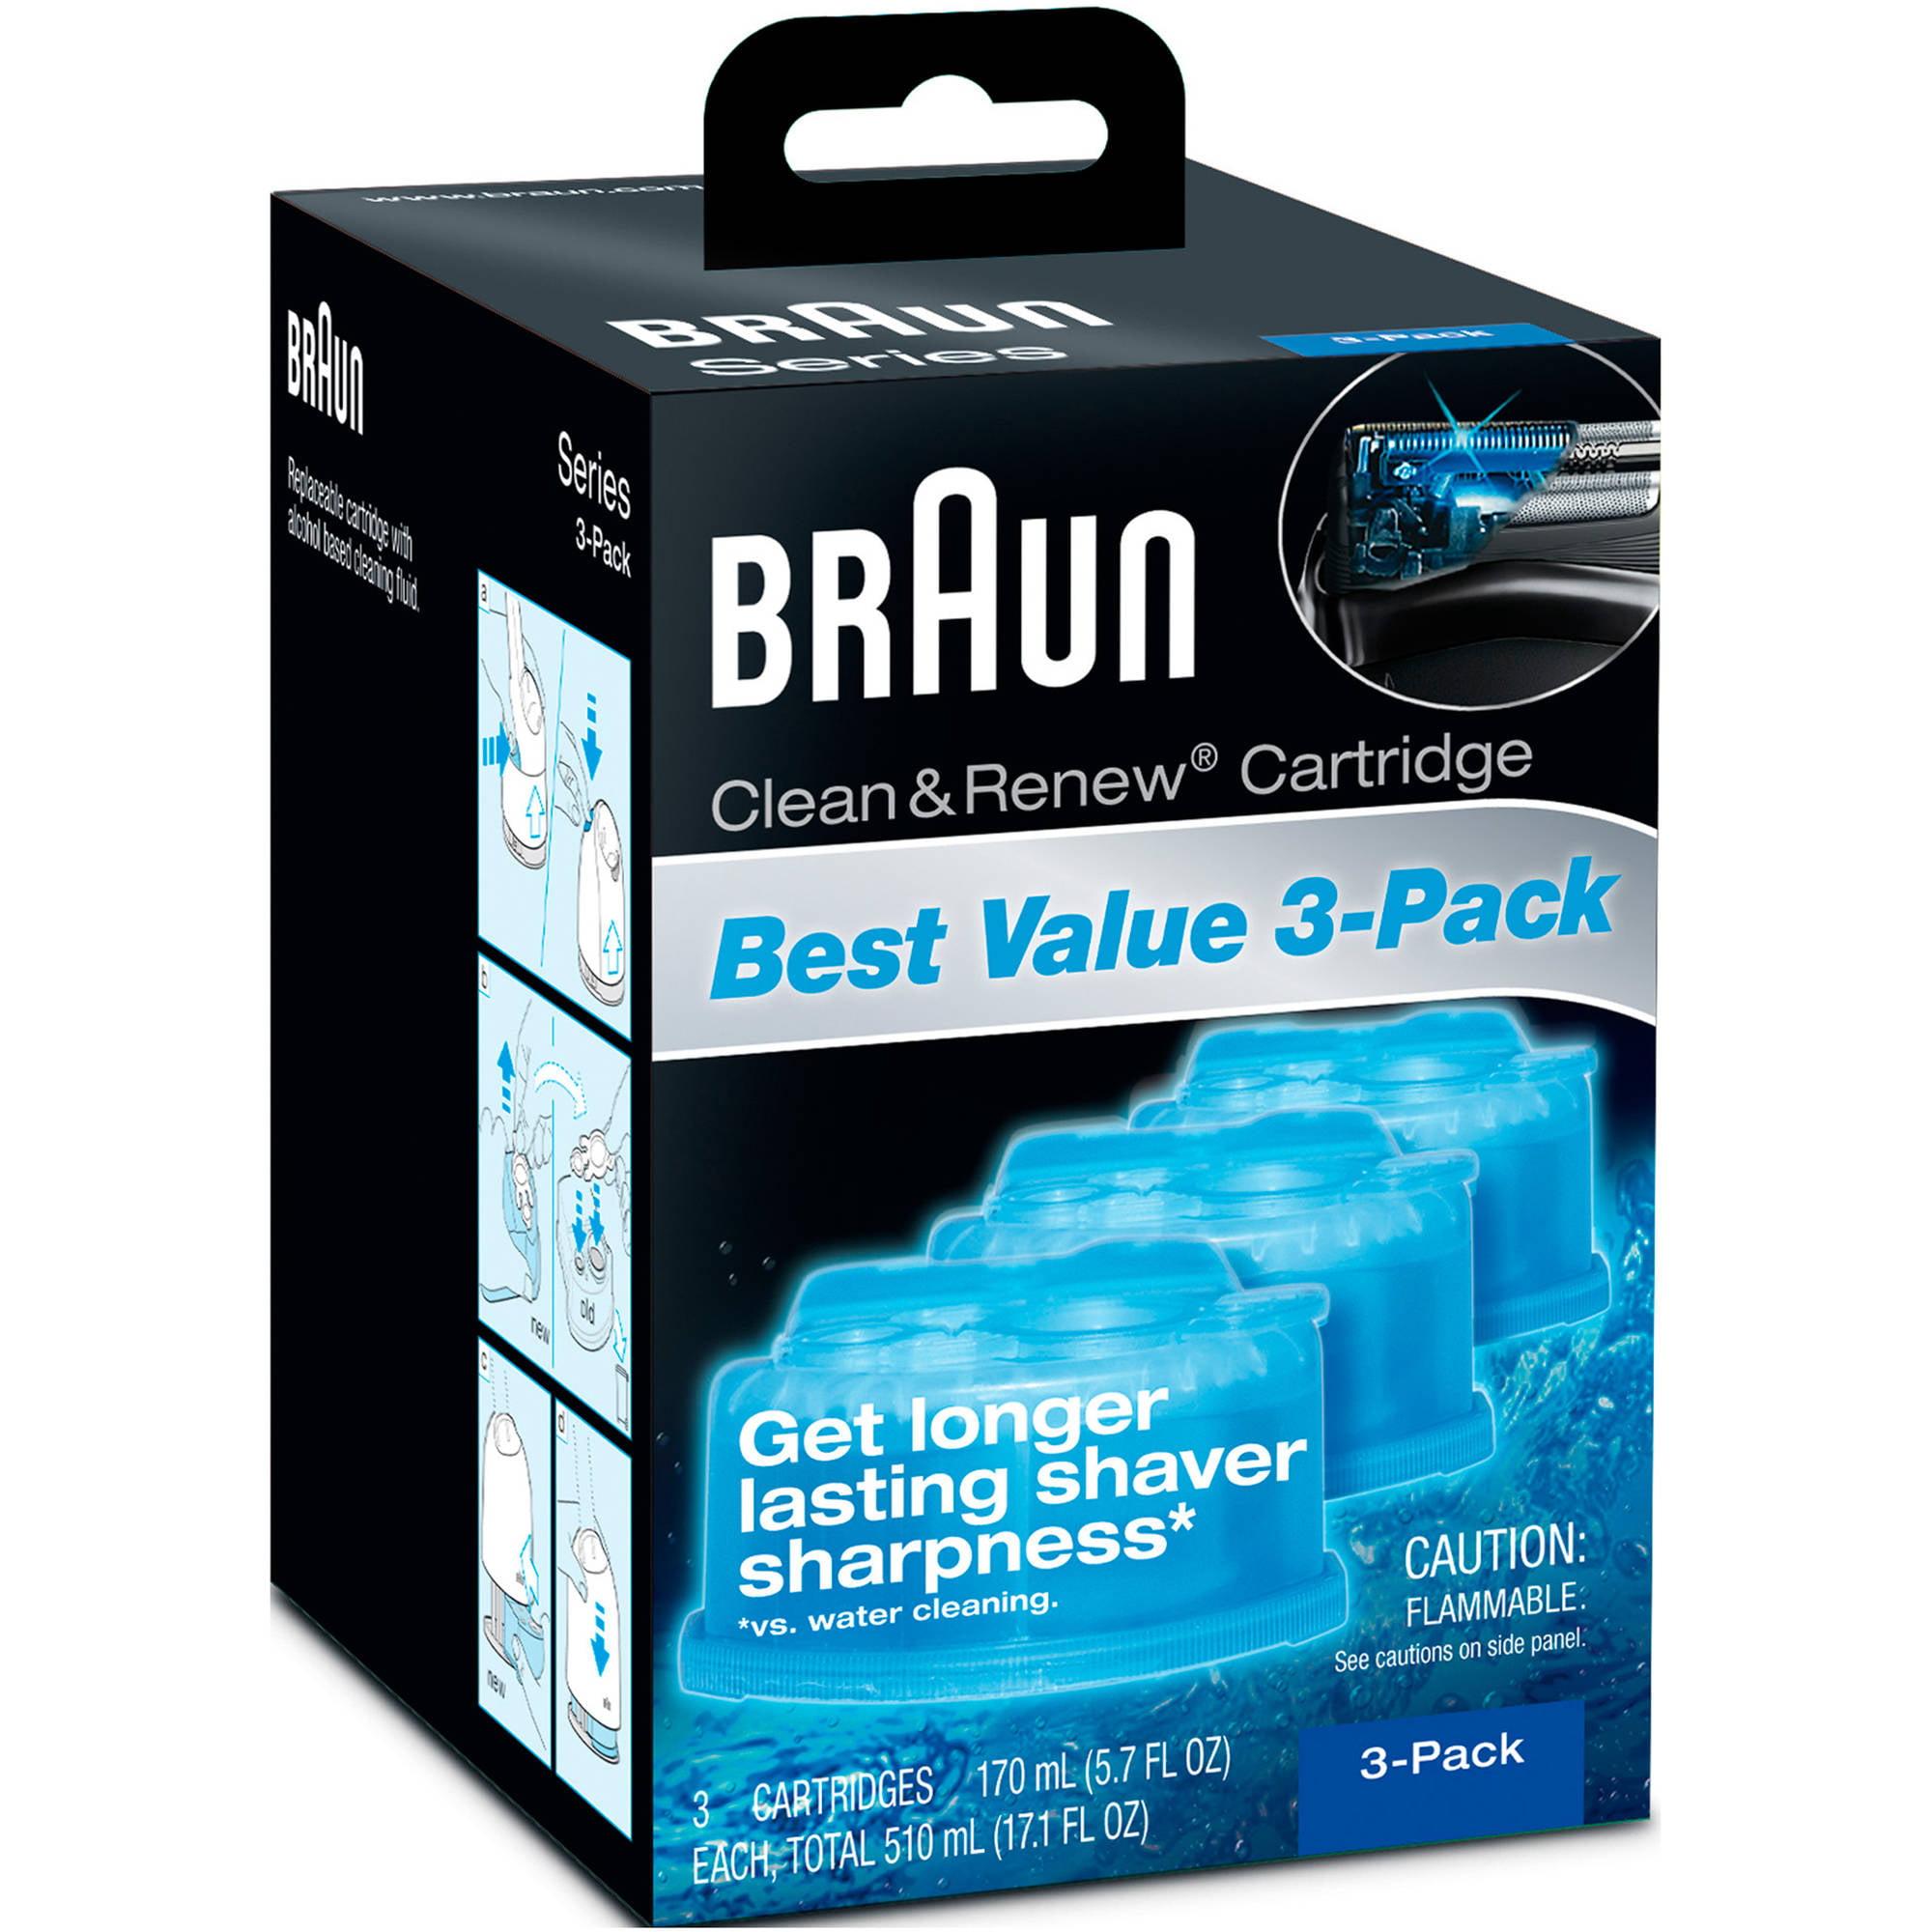 Braun Clean & Renew Refill Cartridges, 3 count